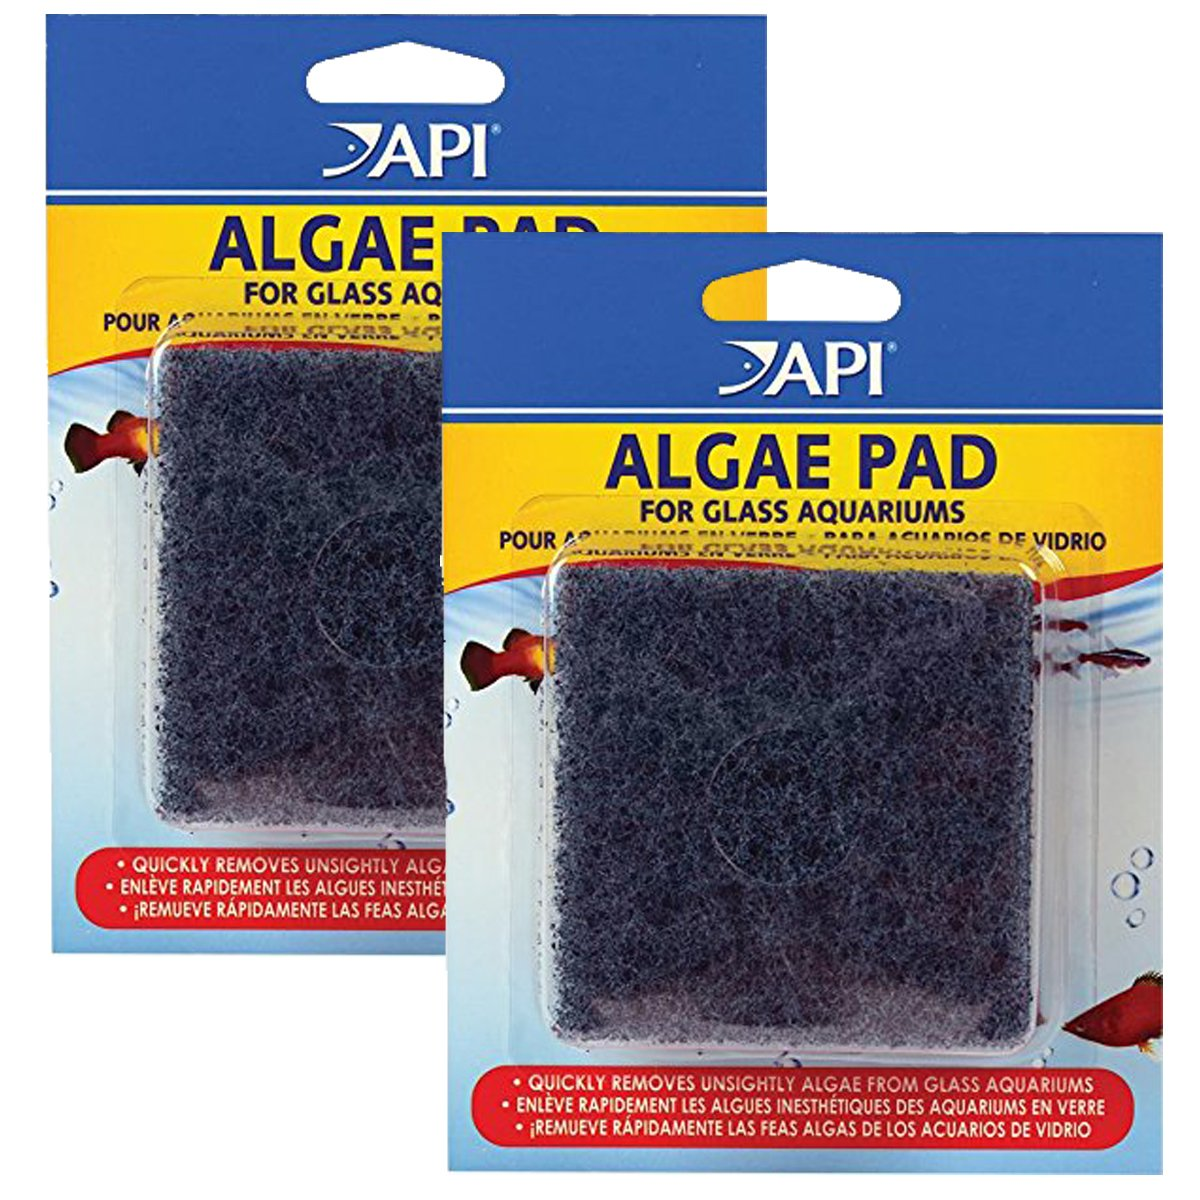 a8efeaf956a1 Amazon.com   API HAND HELD ALGAE PAD For Glass Aquariums 1-Count Container    Aquarium Algae Scrapers   Pet Supplies